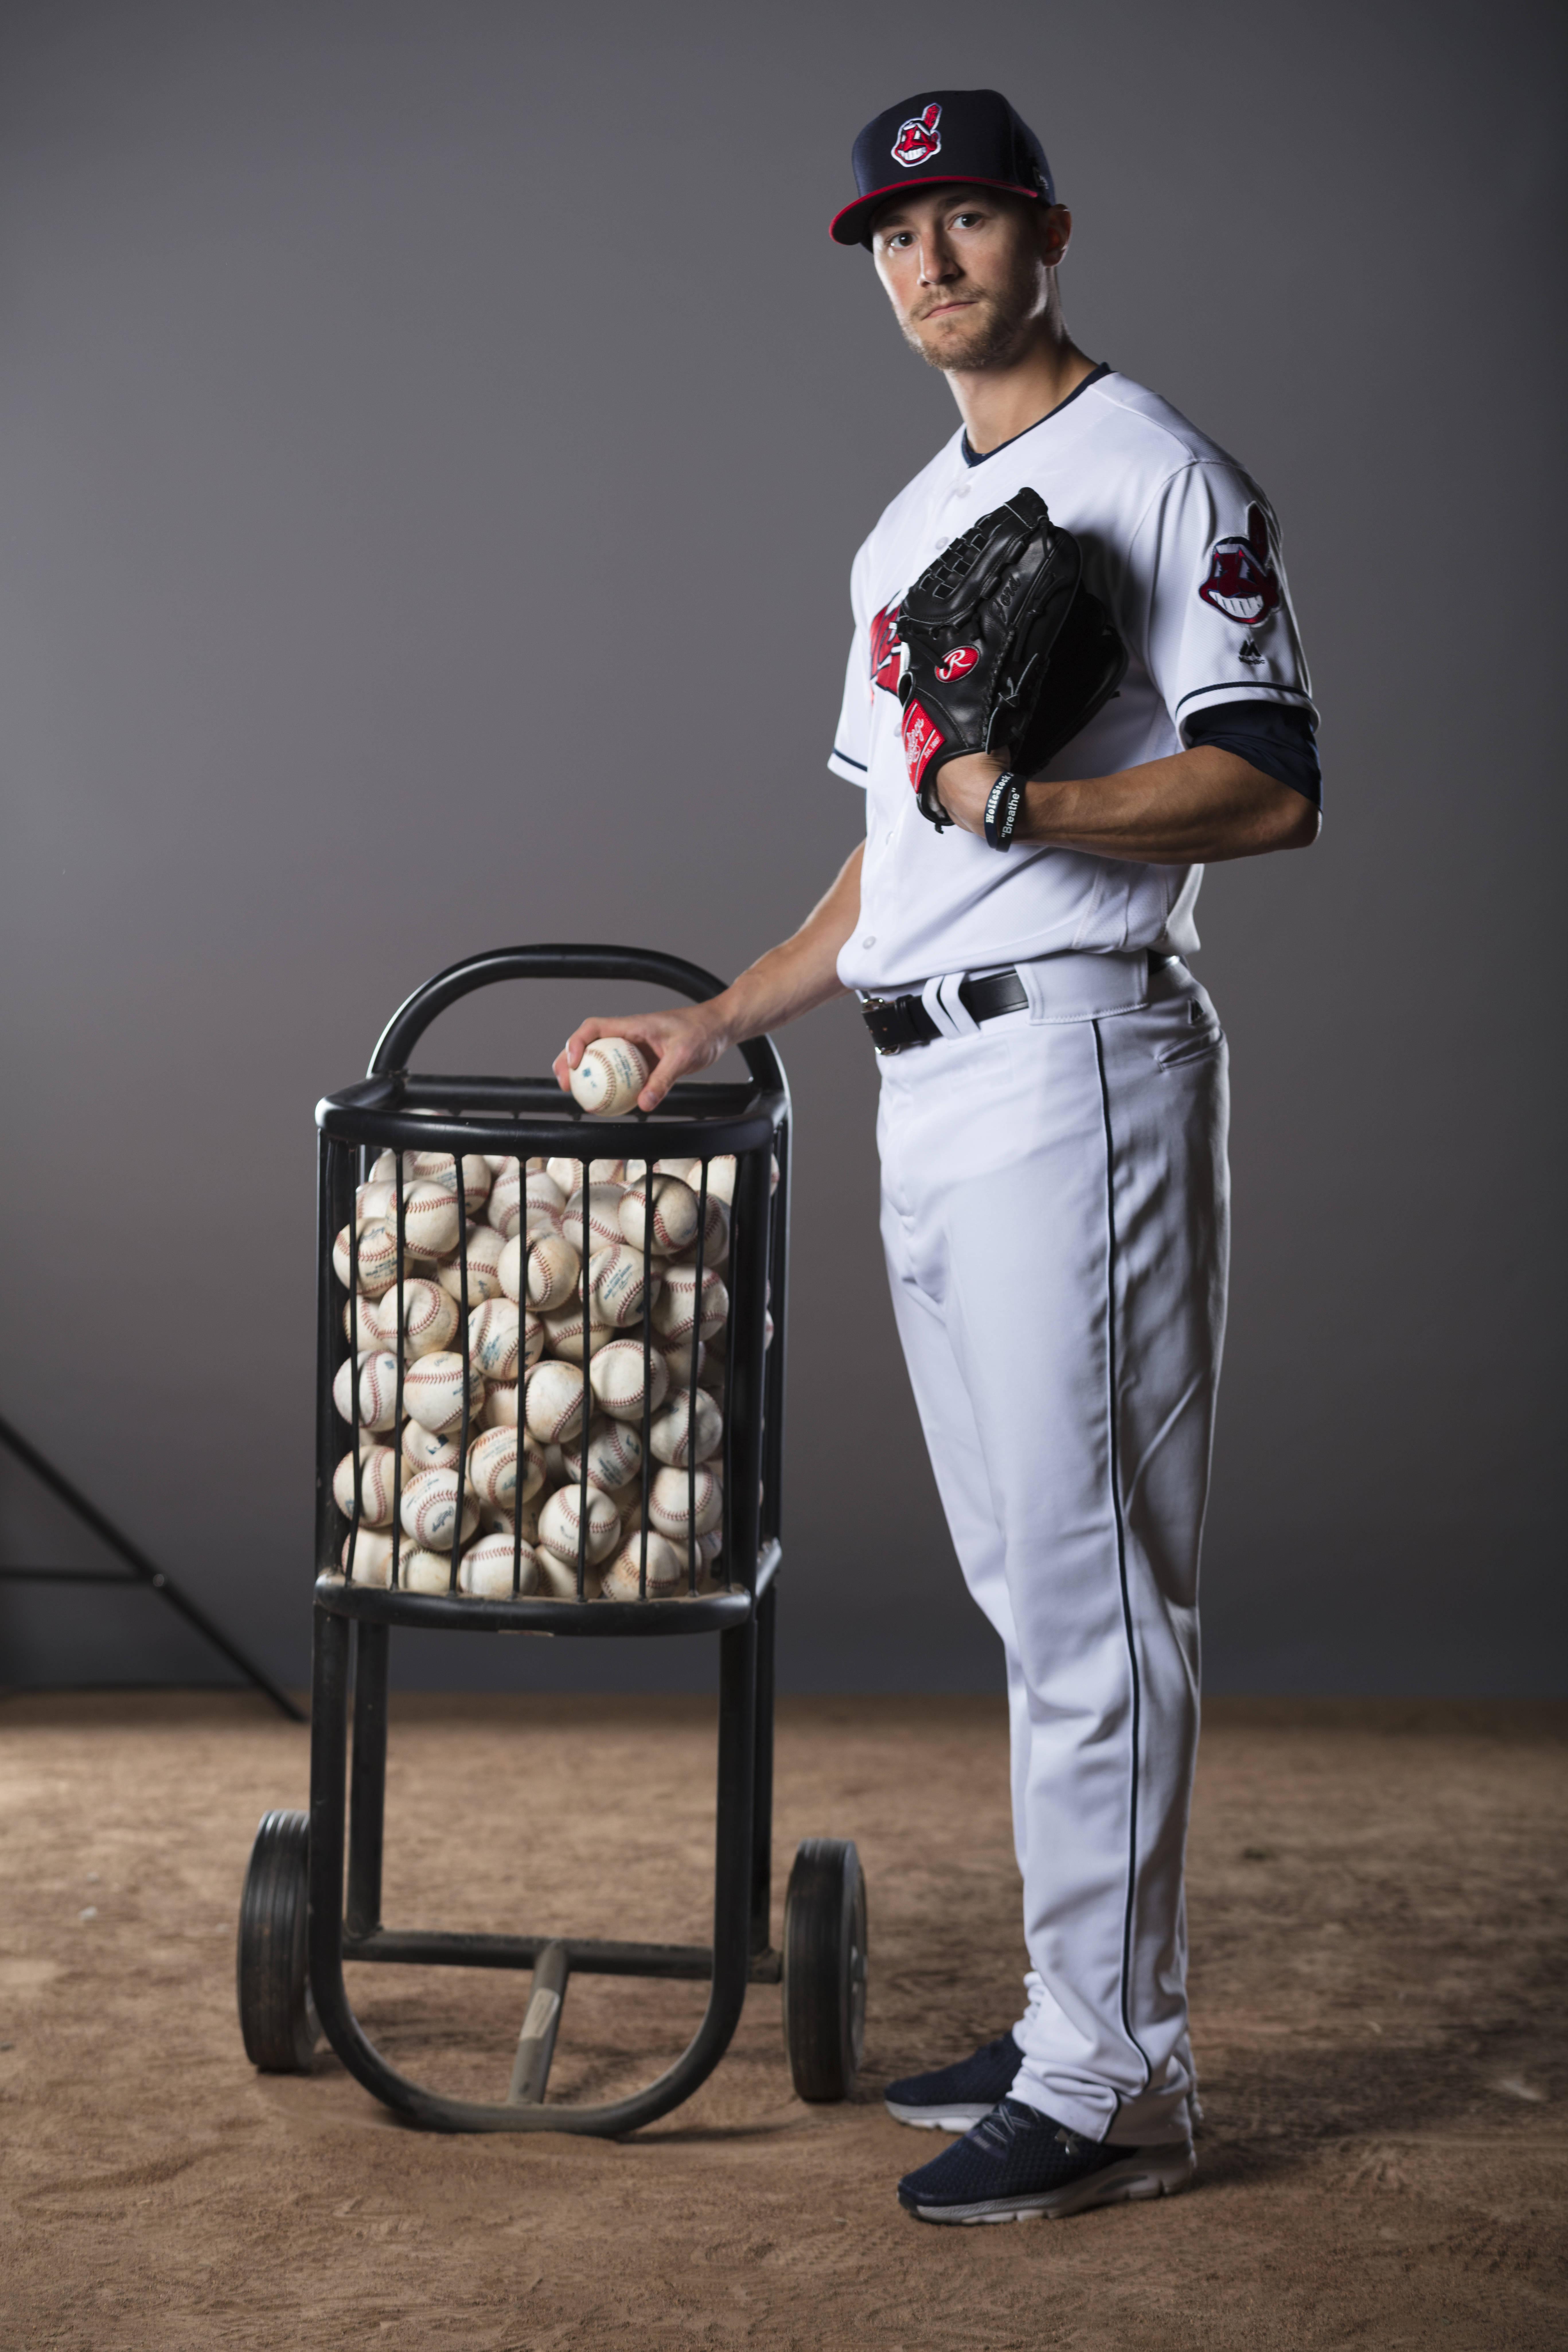 MLB: FEB 24 Cleveland Indians Photo Day